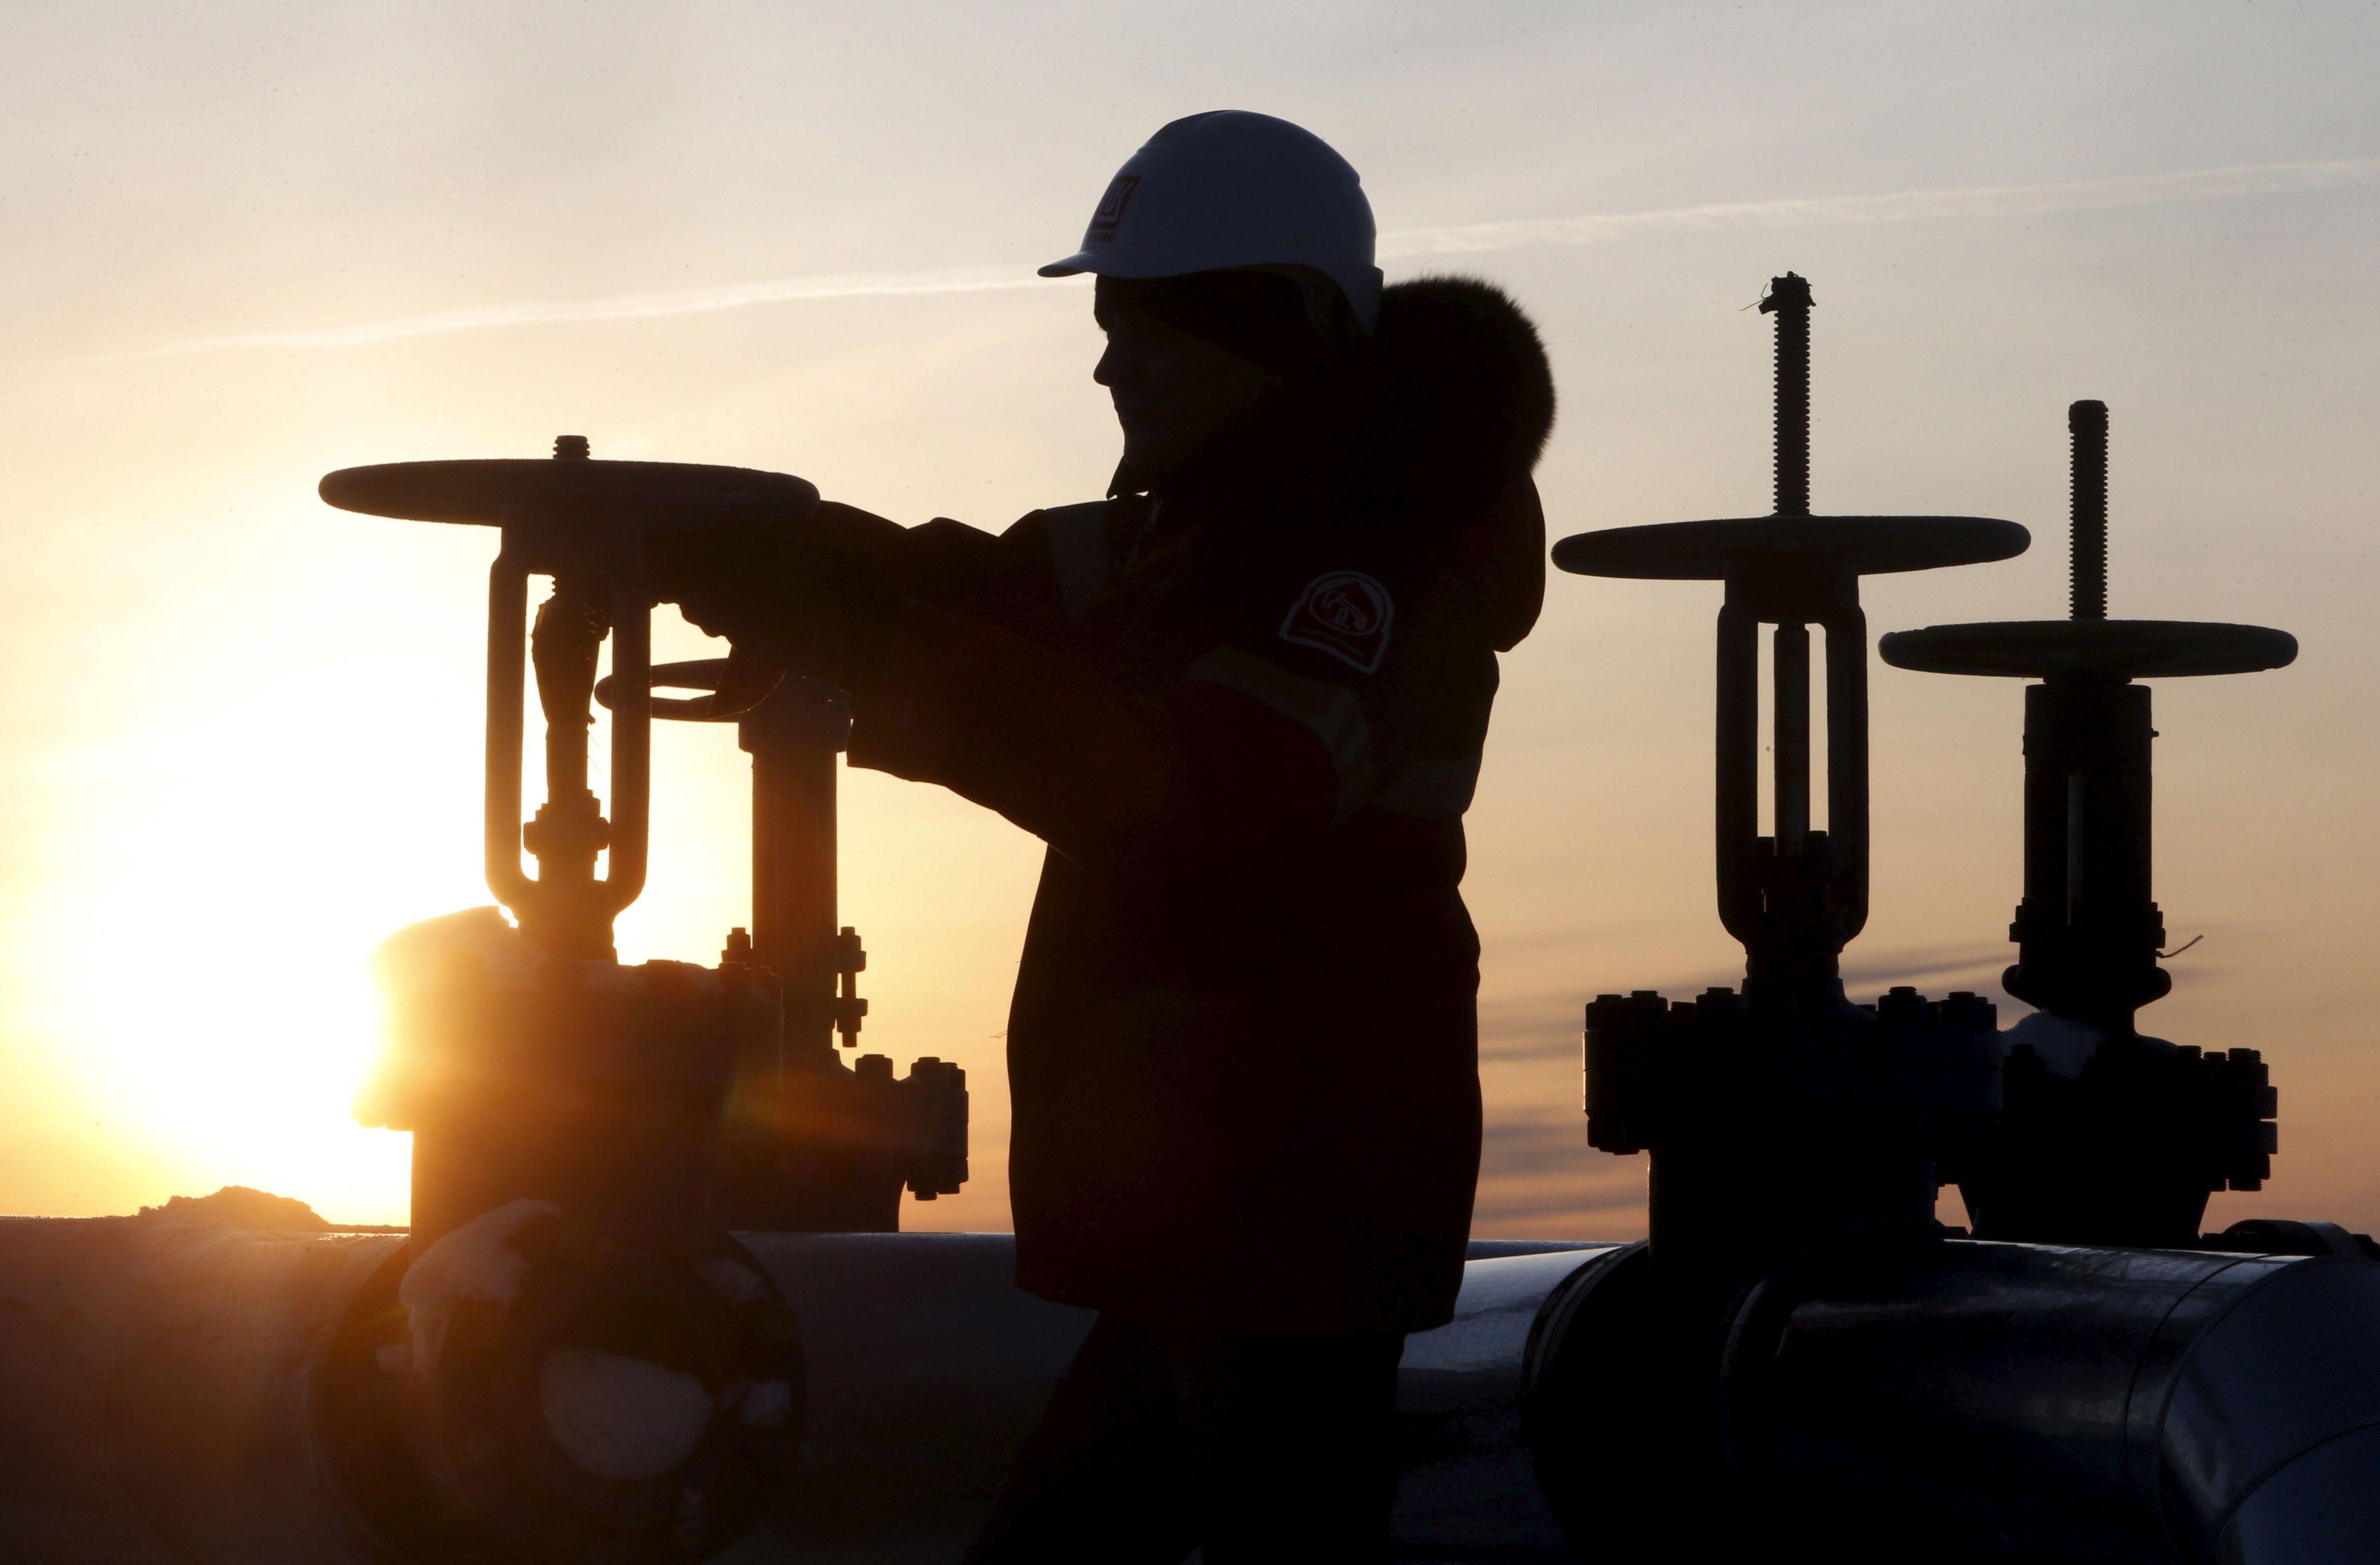 Venesuela imasi OPEC tarpinink�s vaidmens